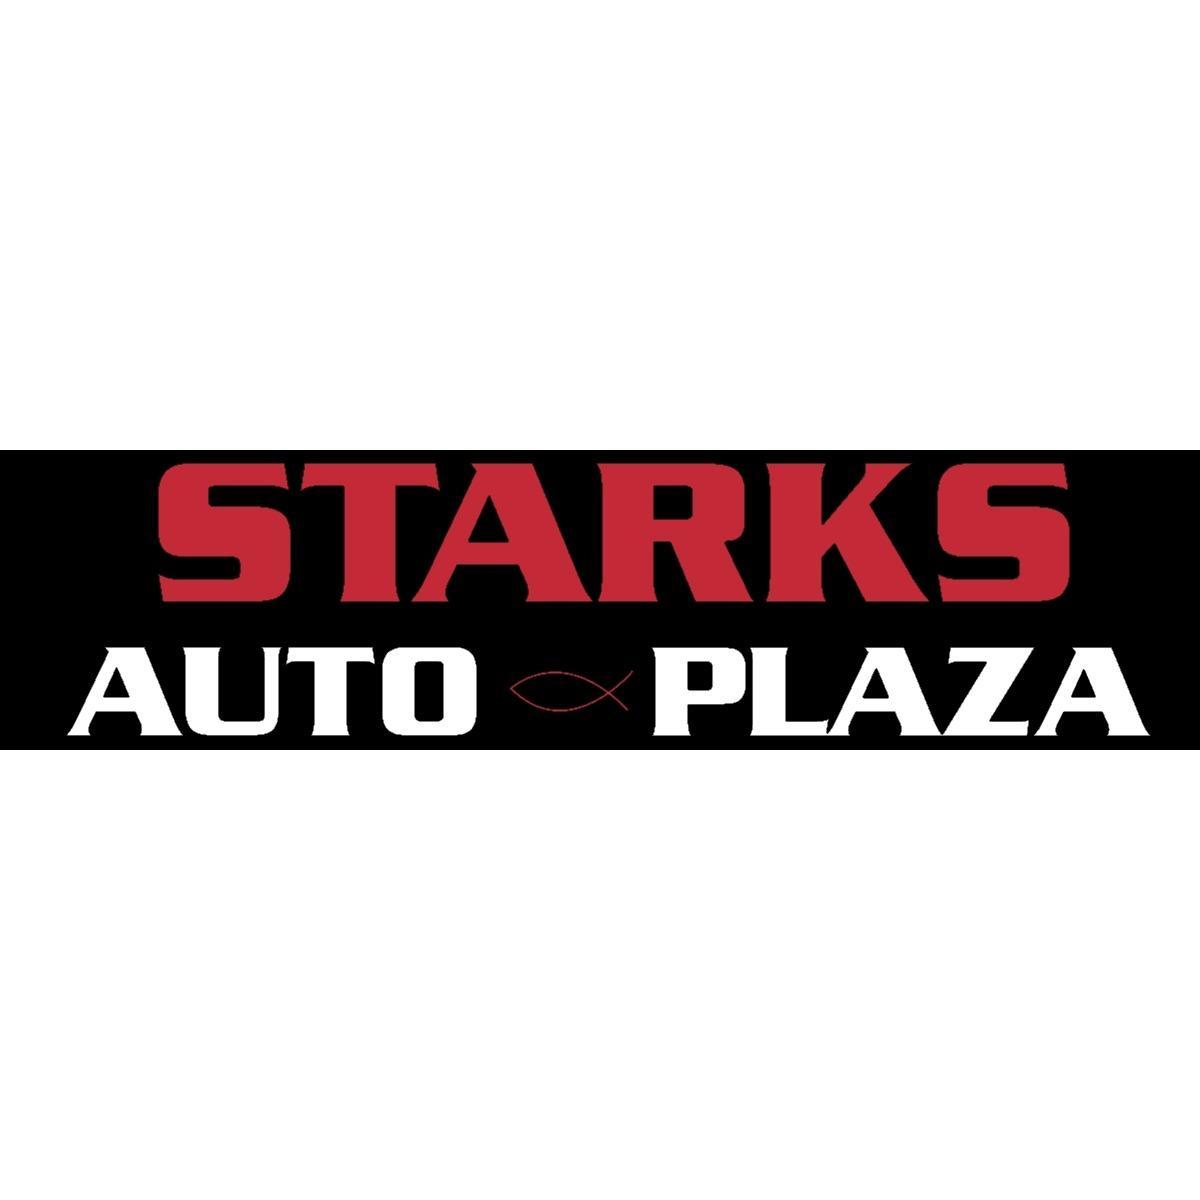 Starks Auto Plaza